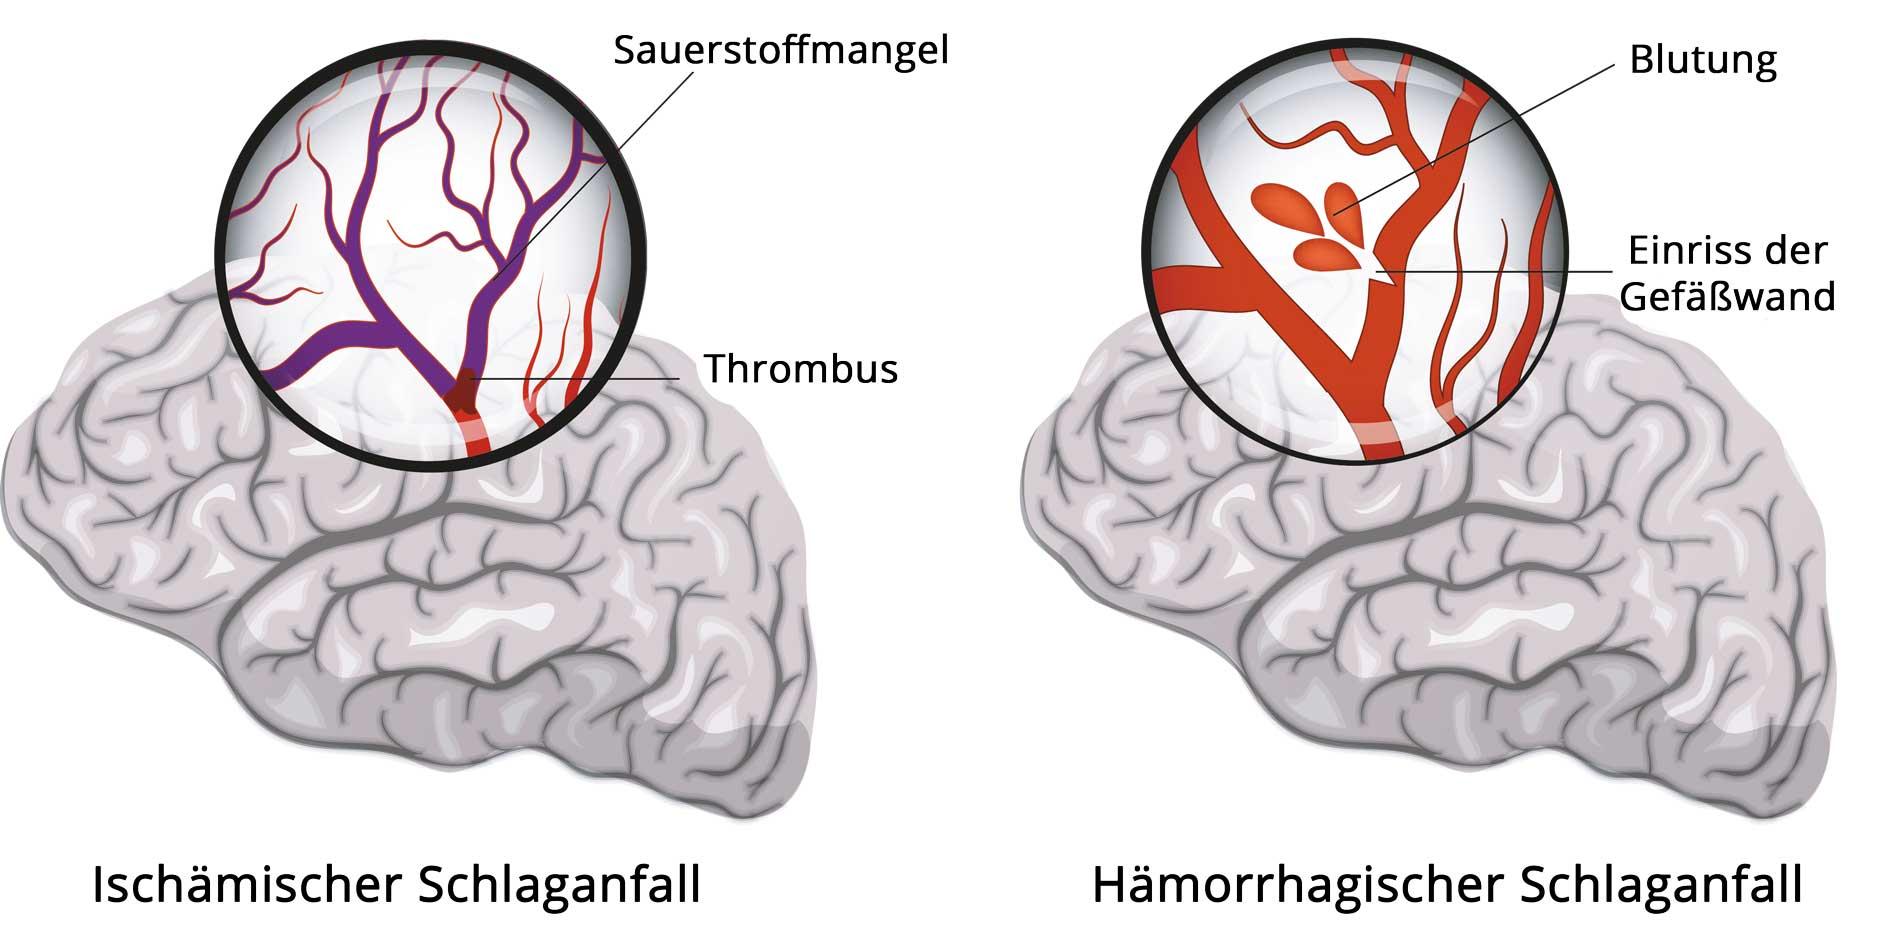 Hirninfarkt (links) und Hirnblutung (rechts)